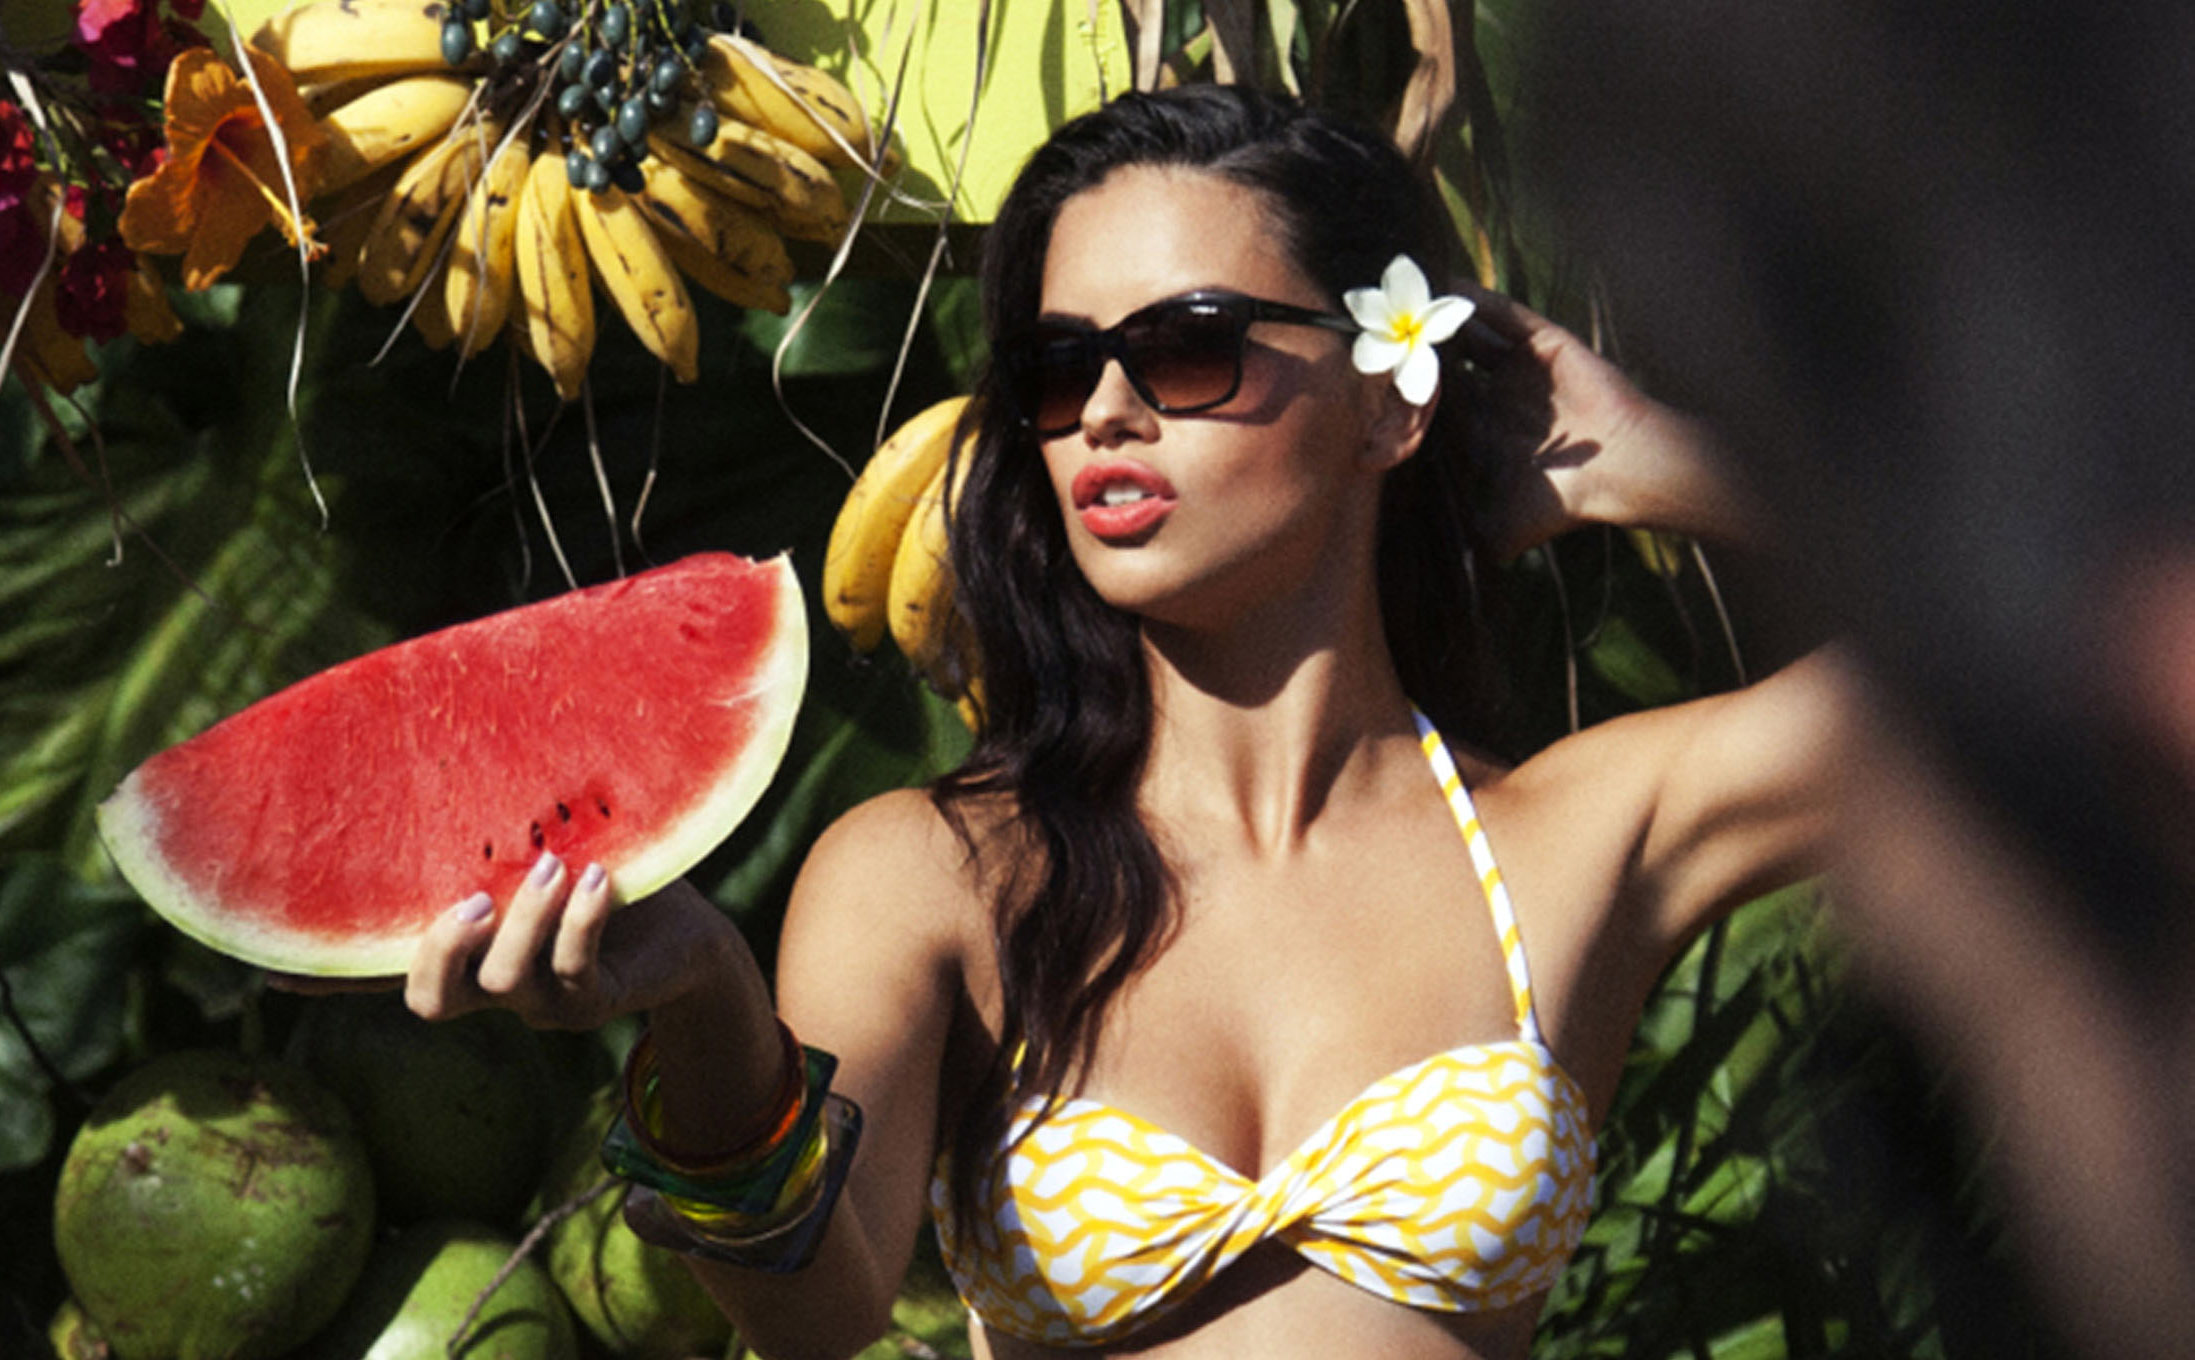 e6d7369ebdf Adriana Lima Rocks Yellow Bikini For Vogue Eyewear Campaign Shoot ...